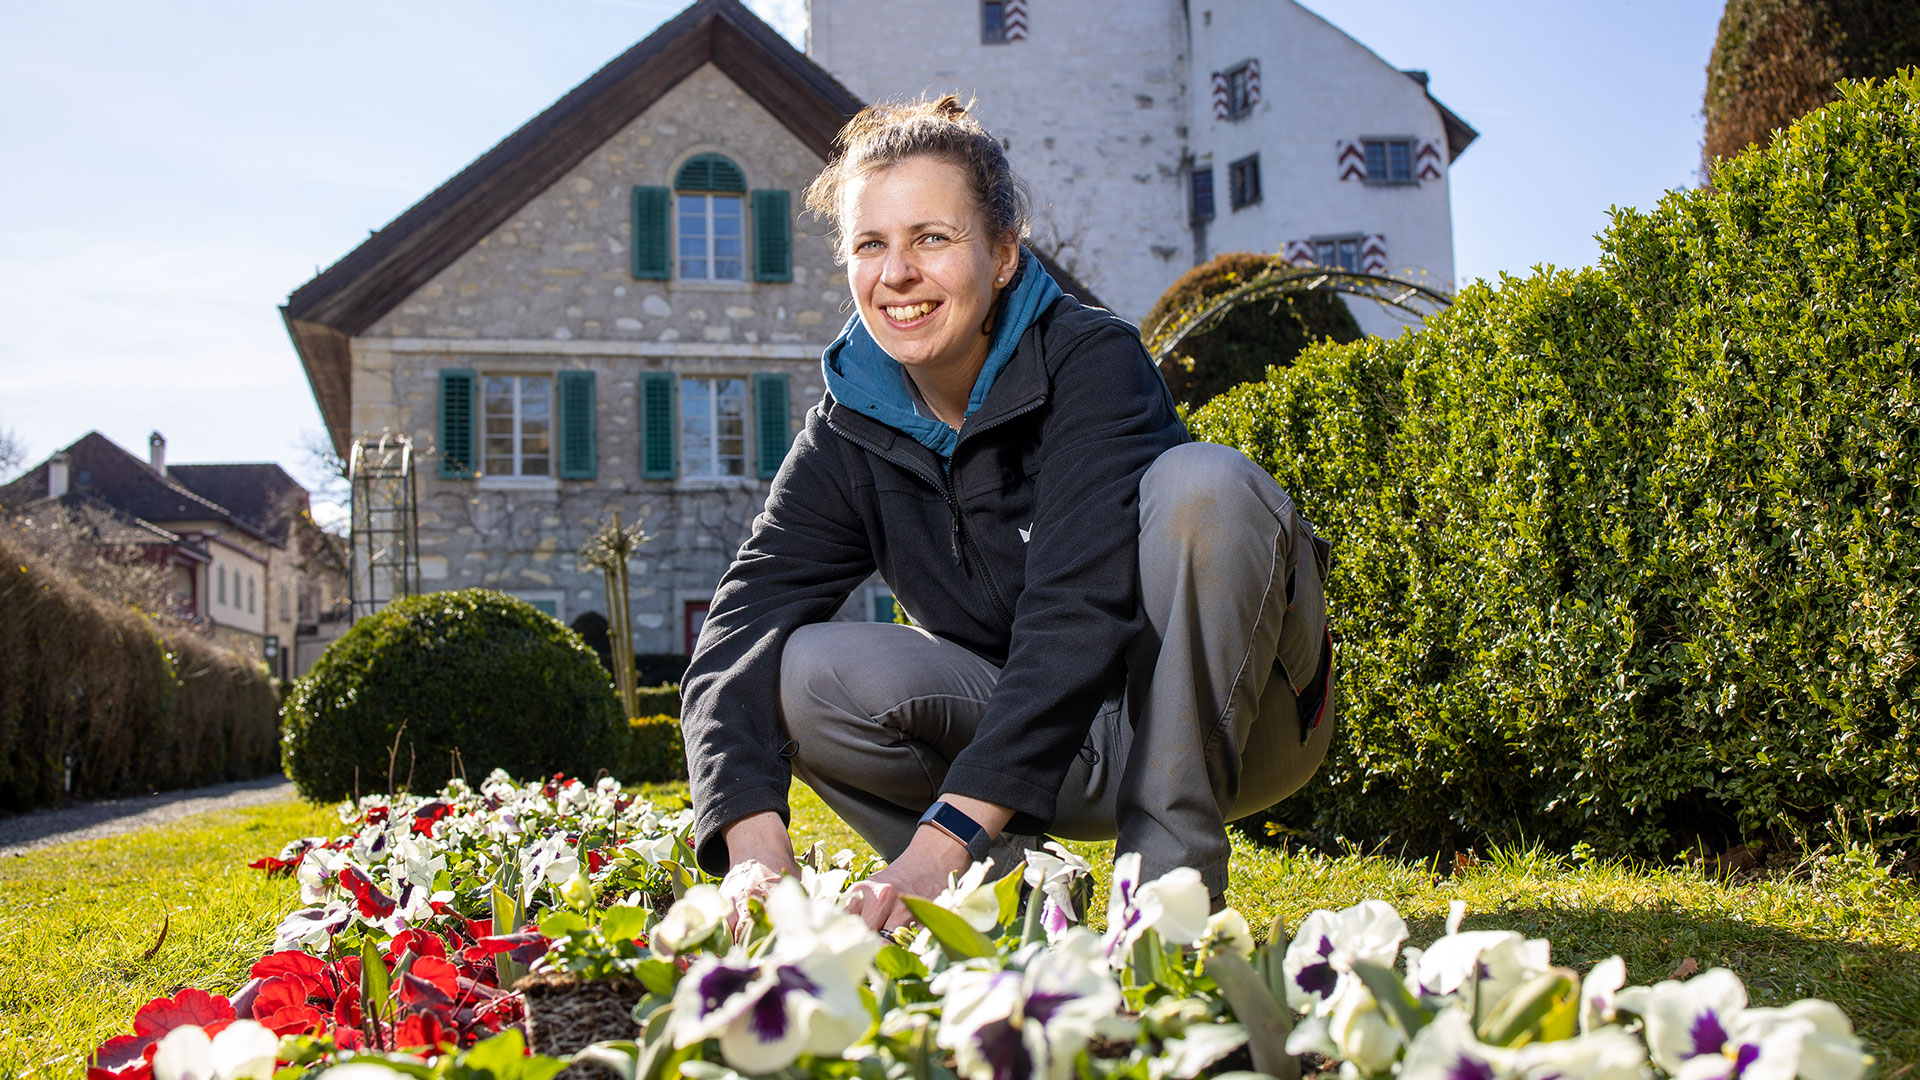 Gärtnerin Melissa Gögele im Rosengarten von Schloss Wildegg